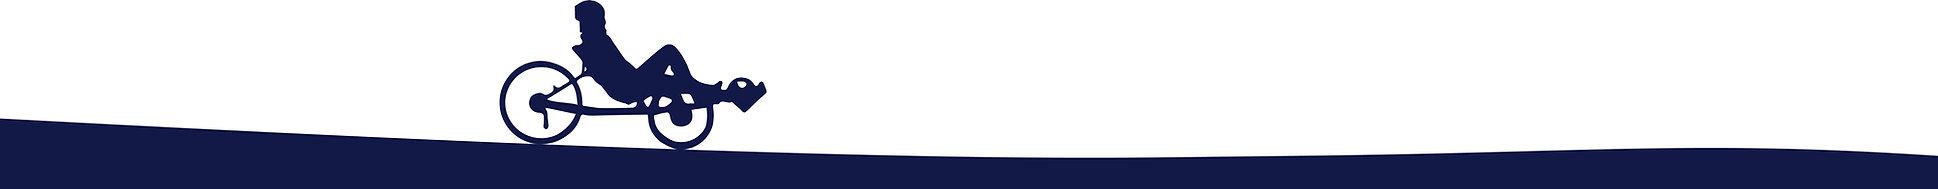 Silhouette Banner Trike.jpg